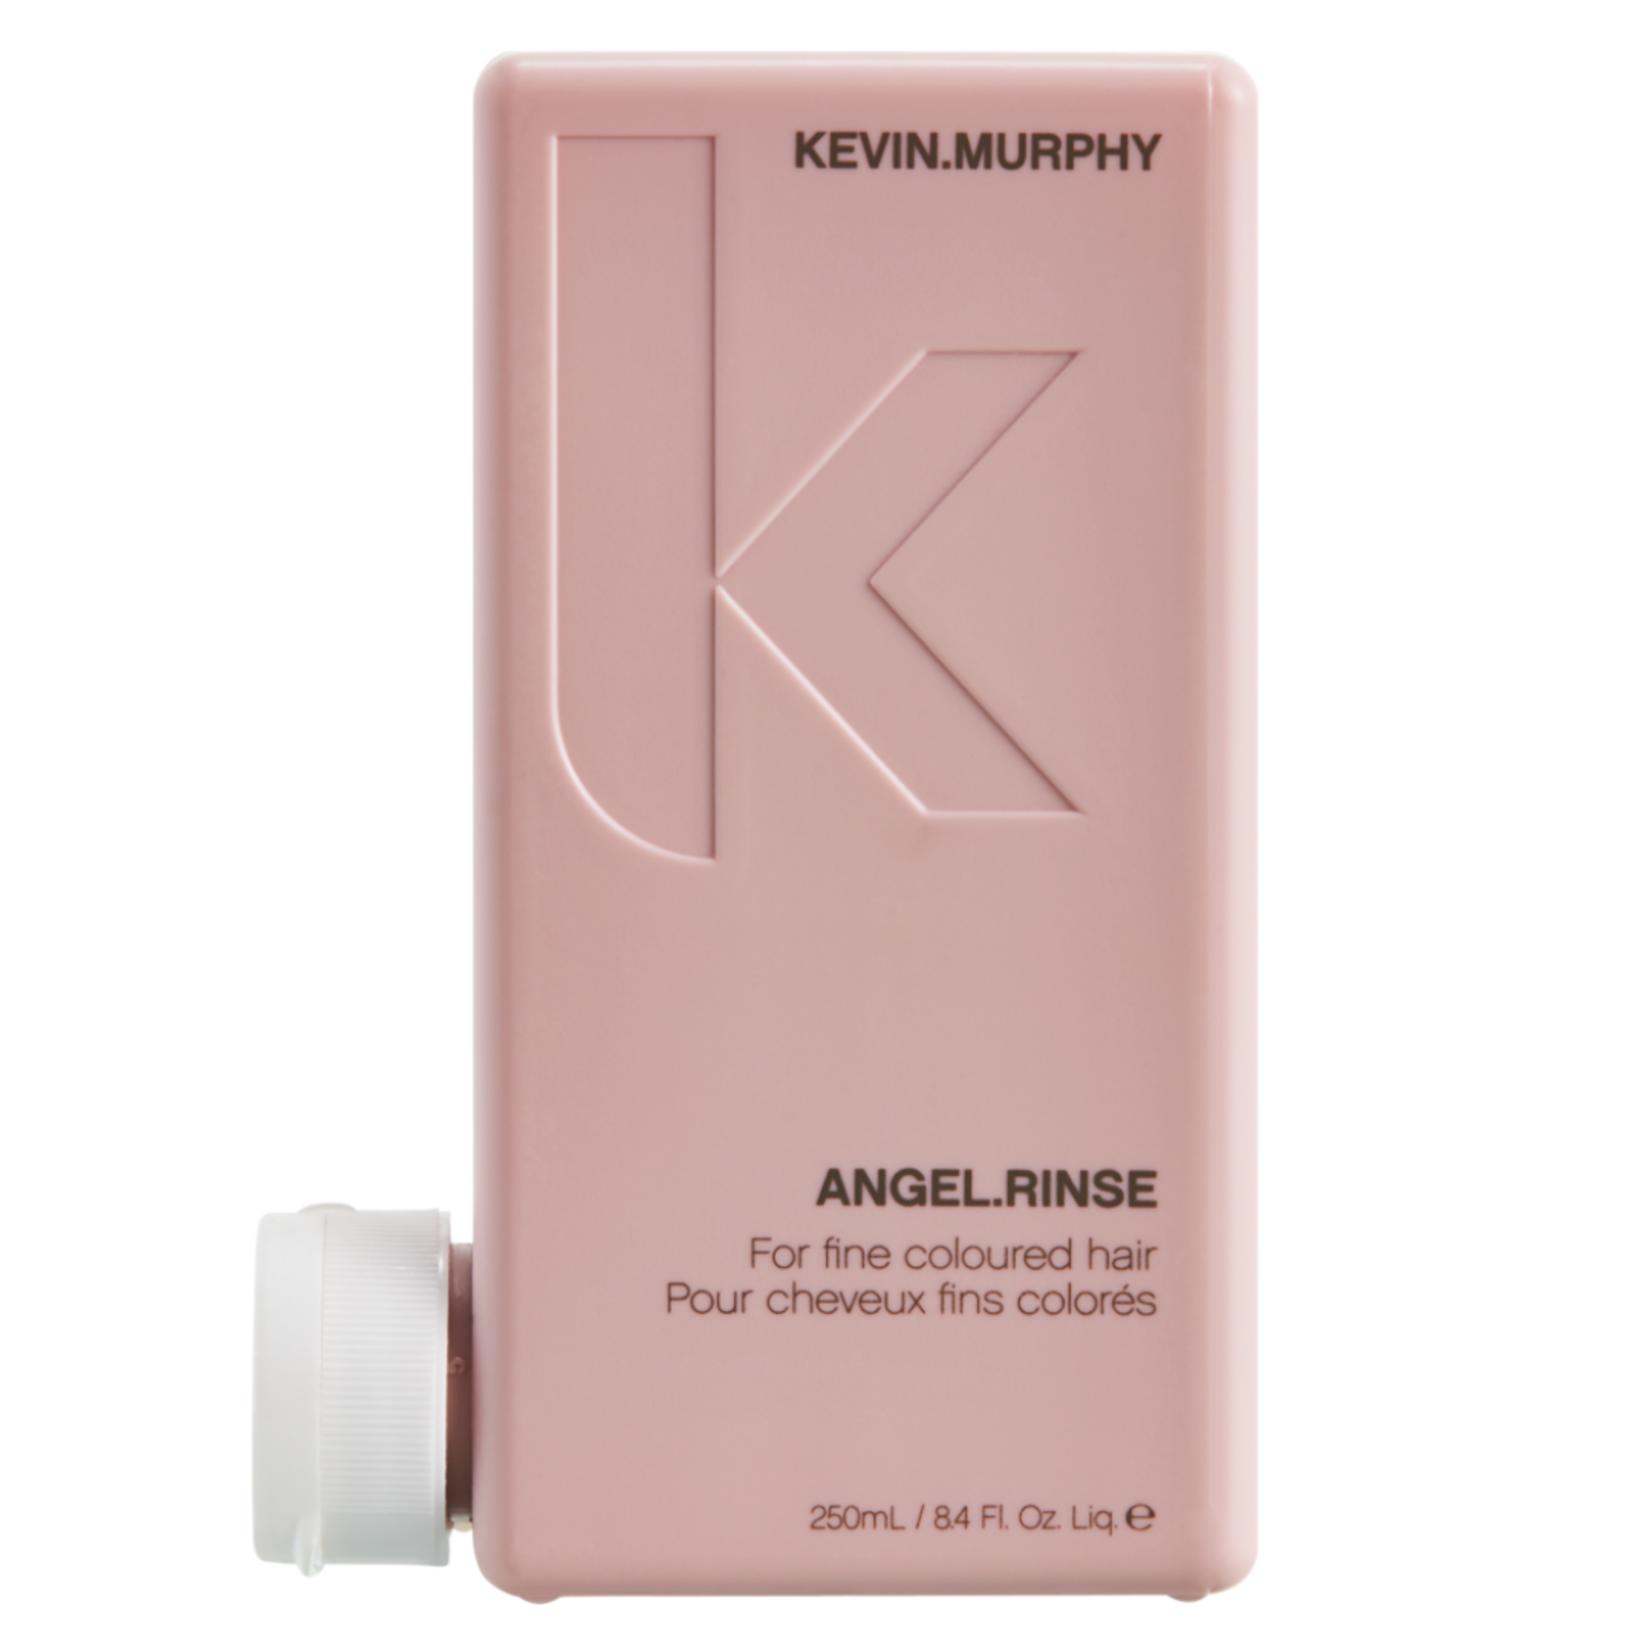 KEVIN.MURPHY KEVIN.MURPHY - ANGEL.RINSE 8.4 oz